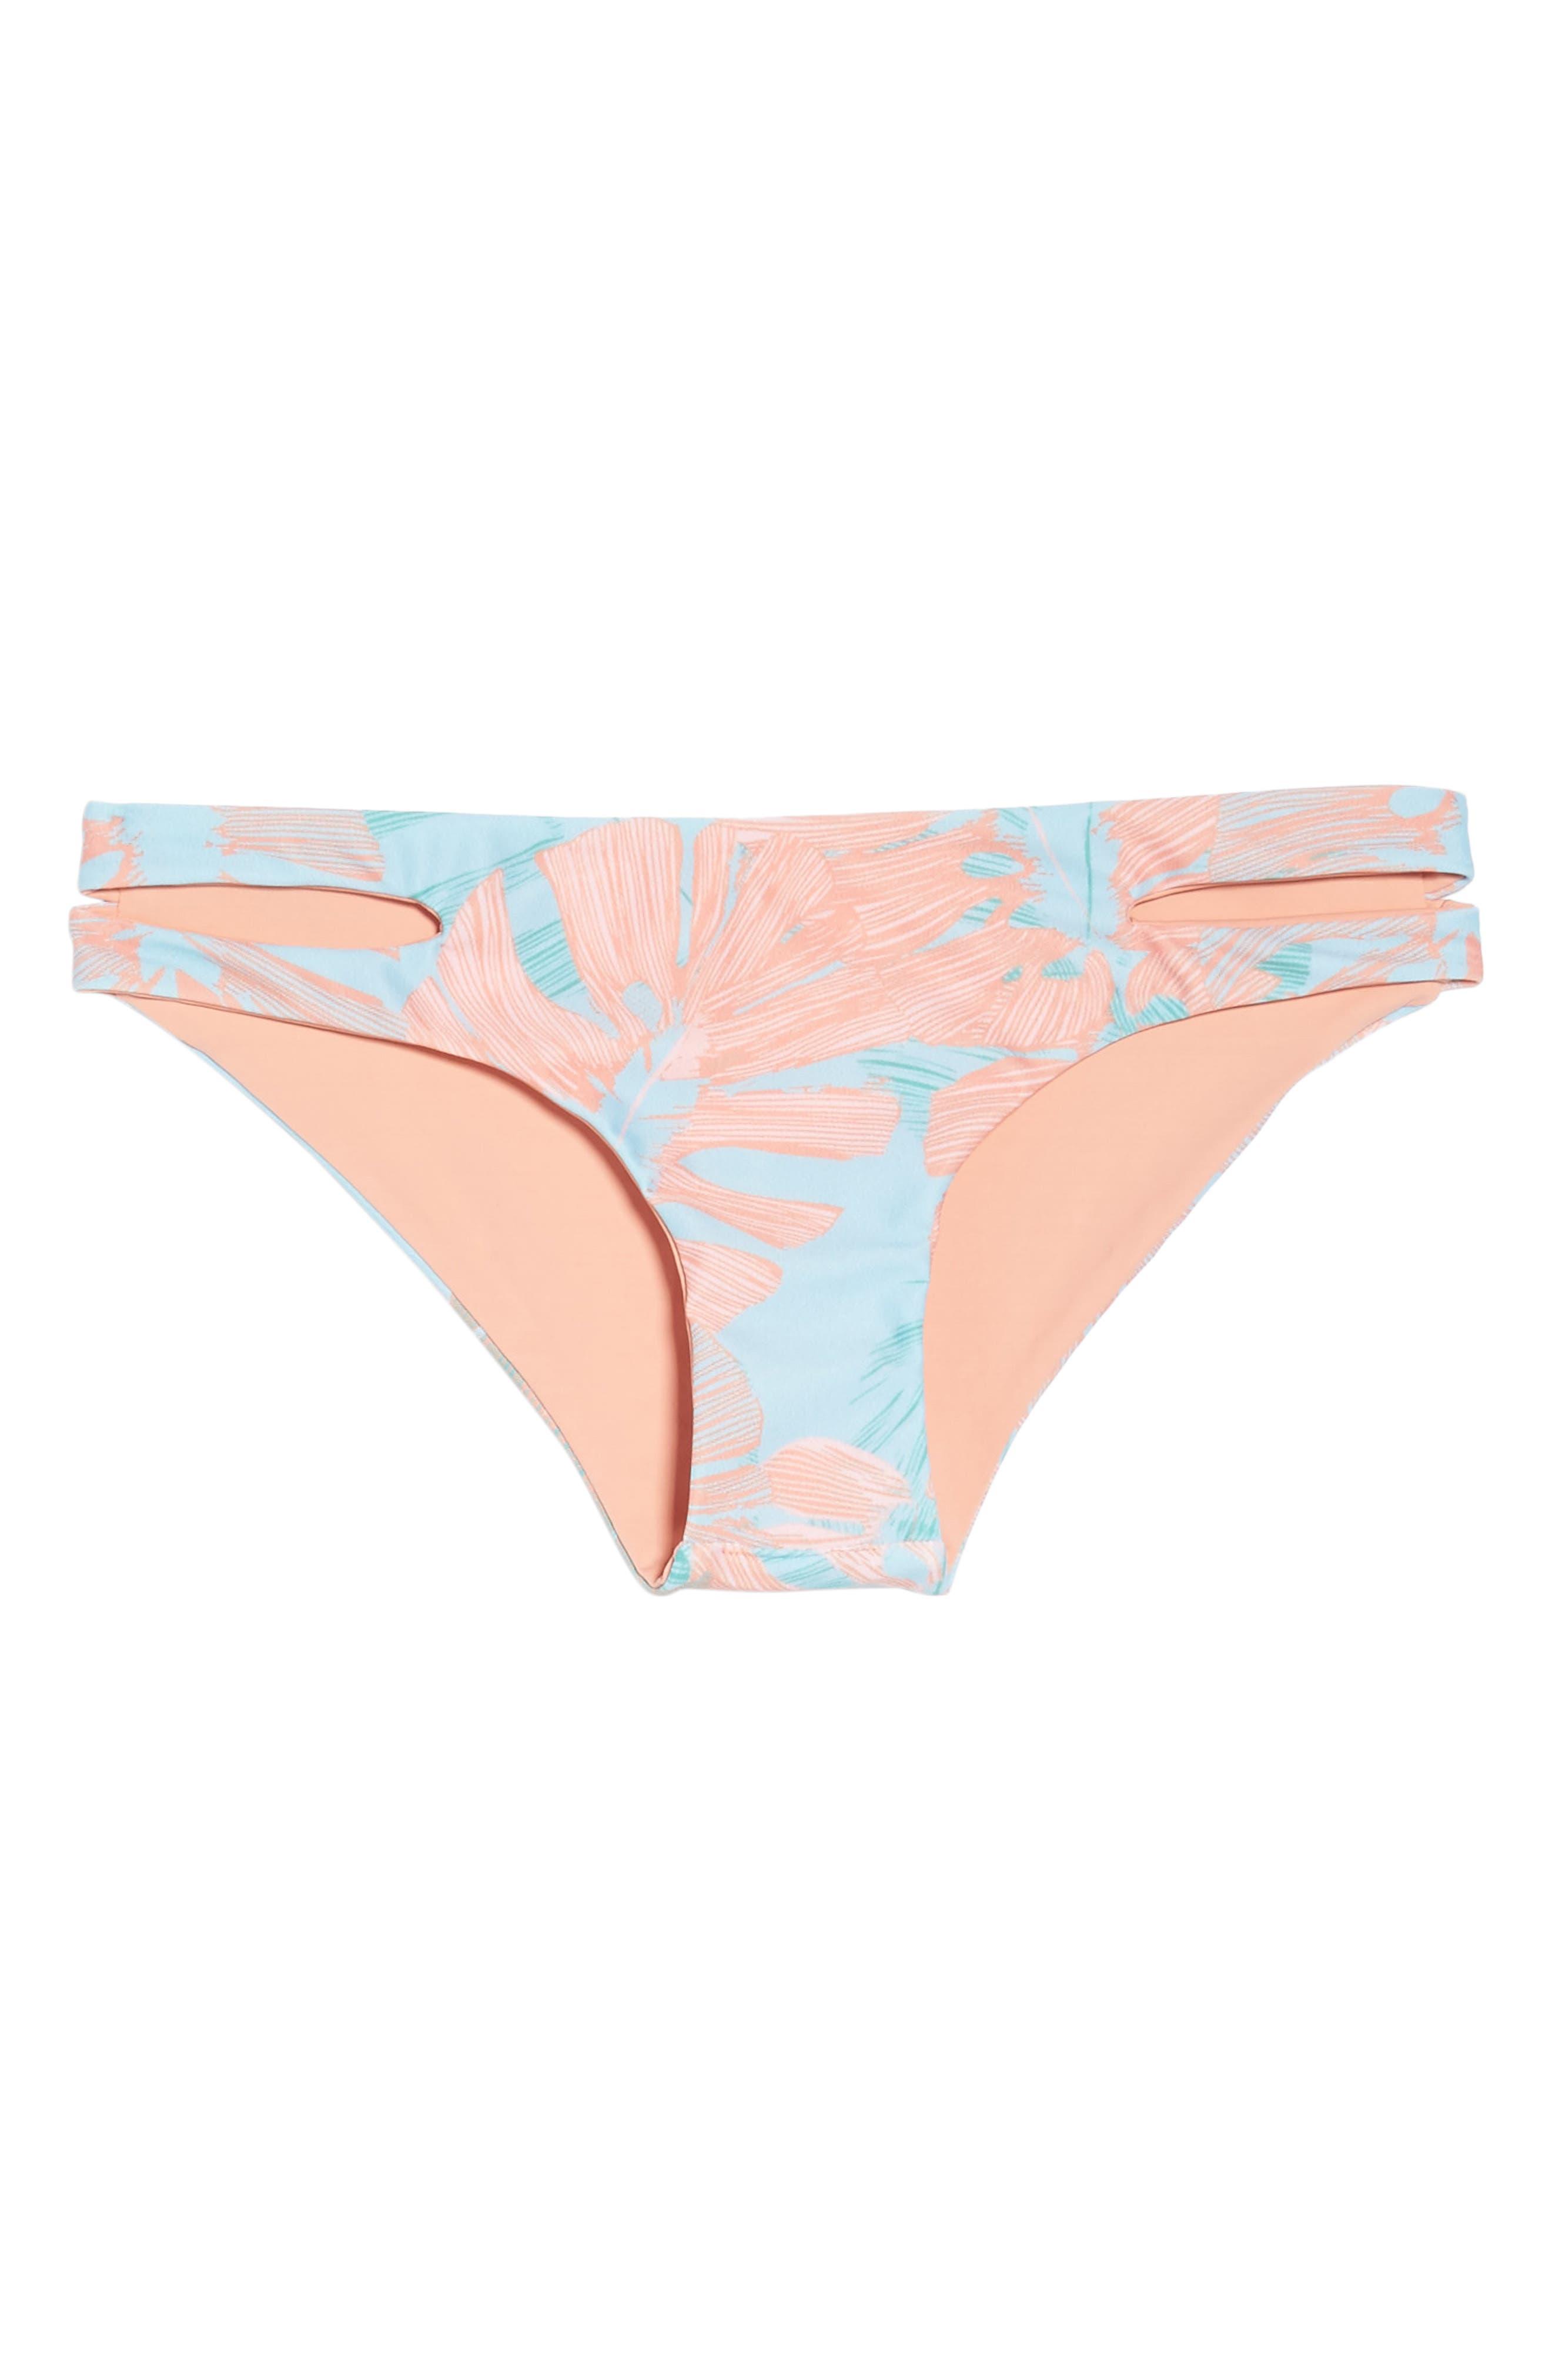 Estella Classic Bikini Bottoms,                             Alternate thumbnail 10, color,                             Bungalow Palm